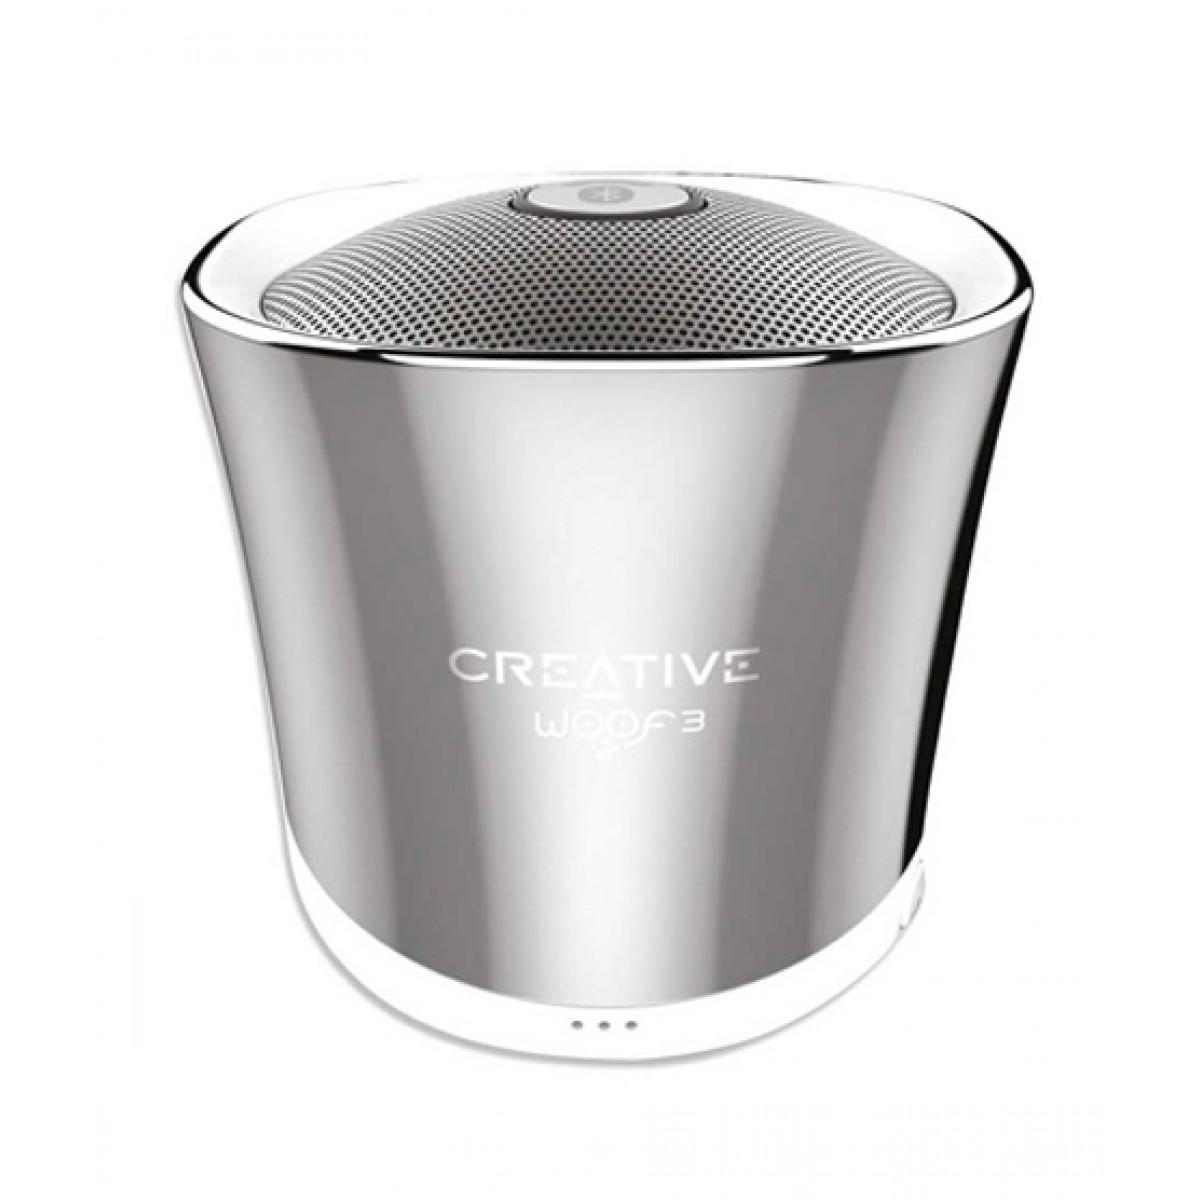 Creative Woof 3 Personal Micro-Sized Bluetooth Speaker